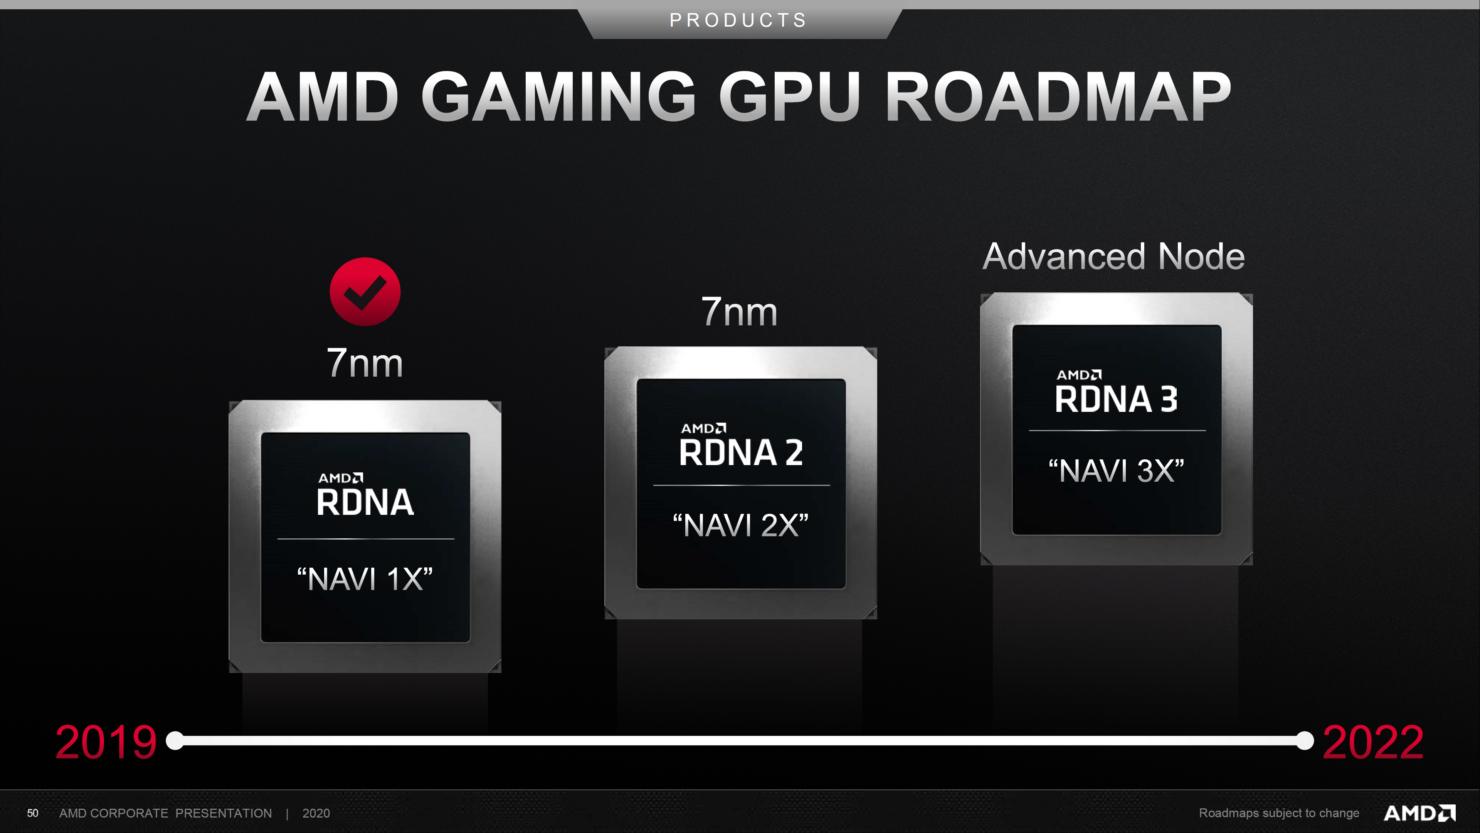 amd-radeon-gaming-gpu-roadmap-2019-2022